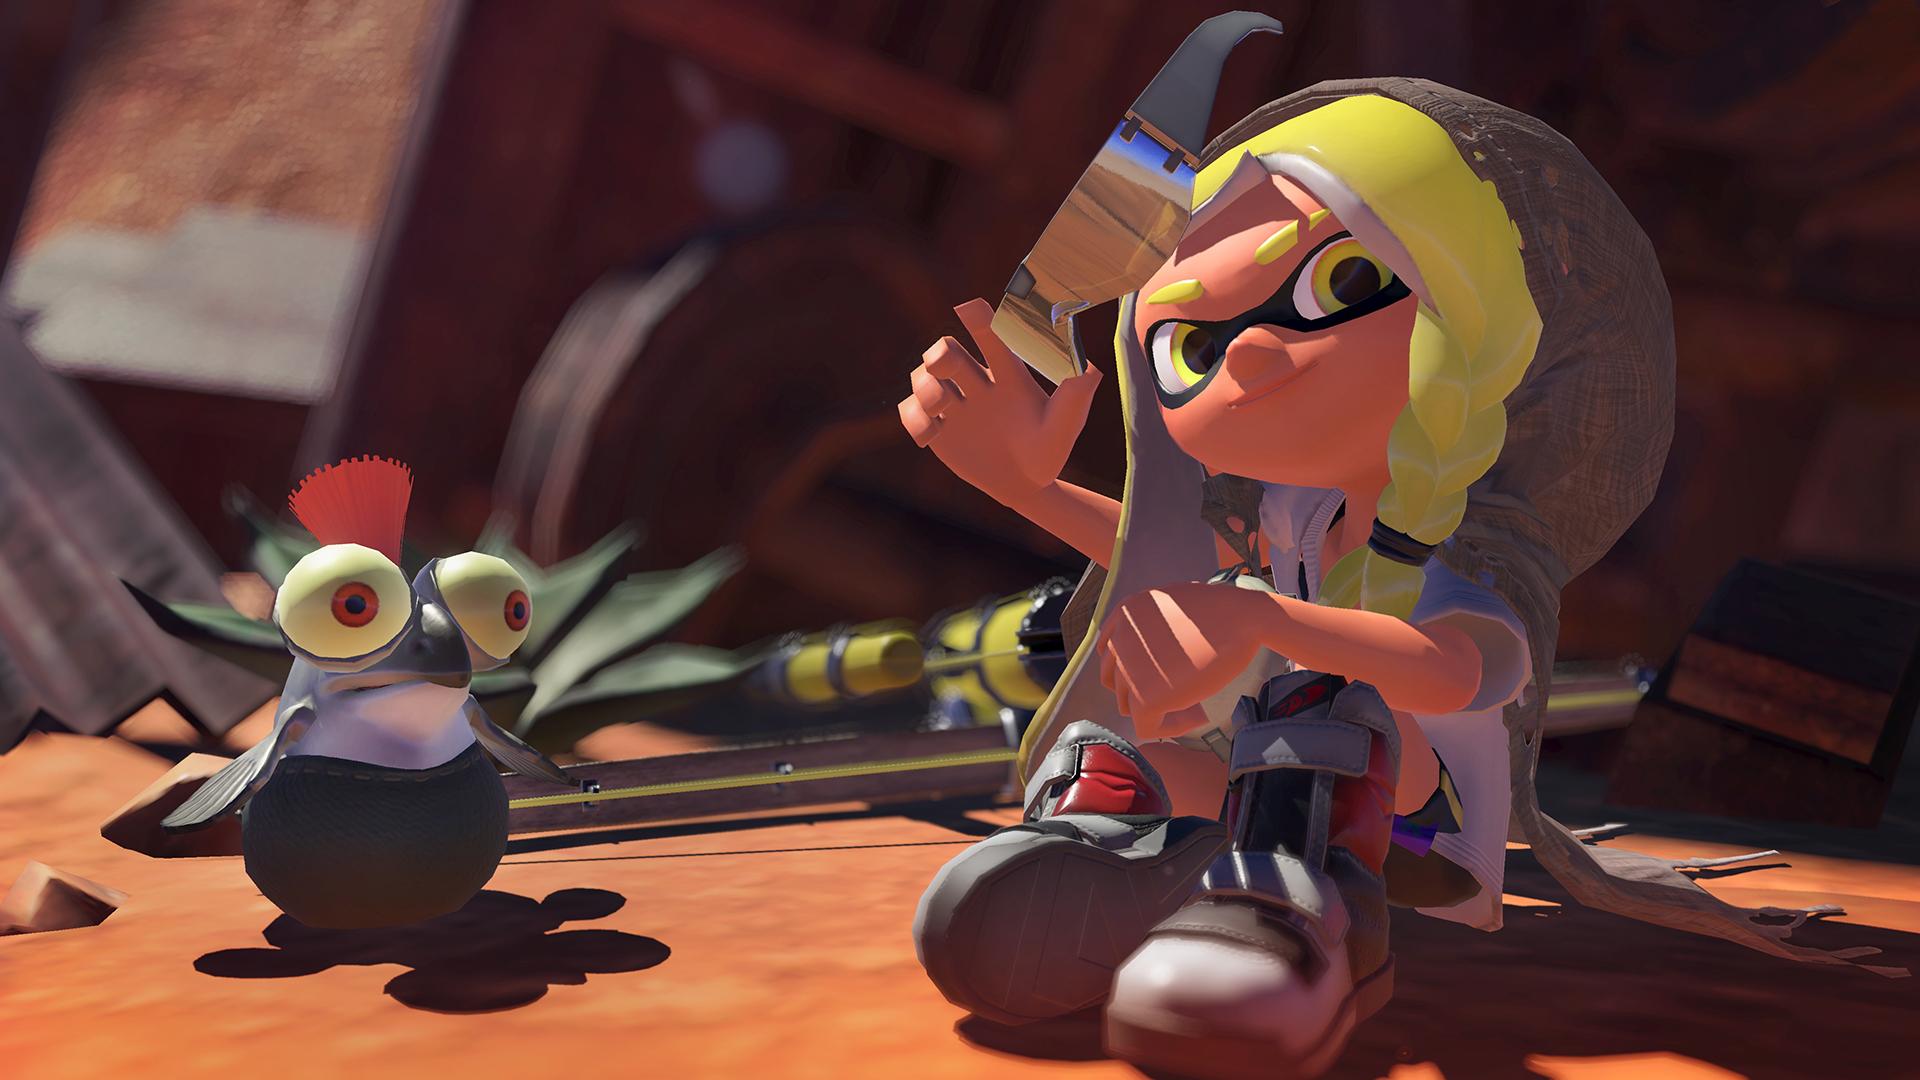 Annonce du jeu Splatoon 3 sur Nintendo Switch